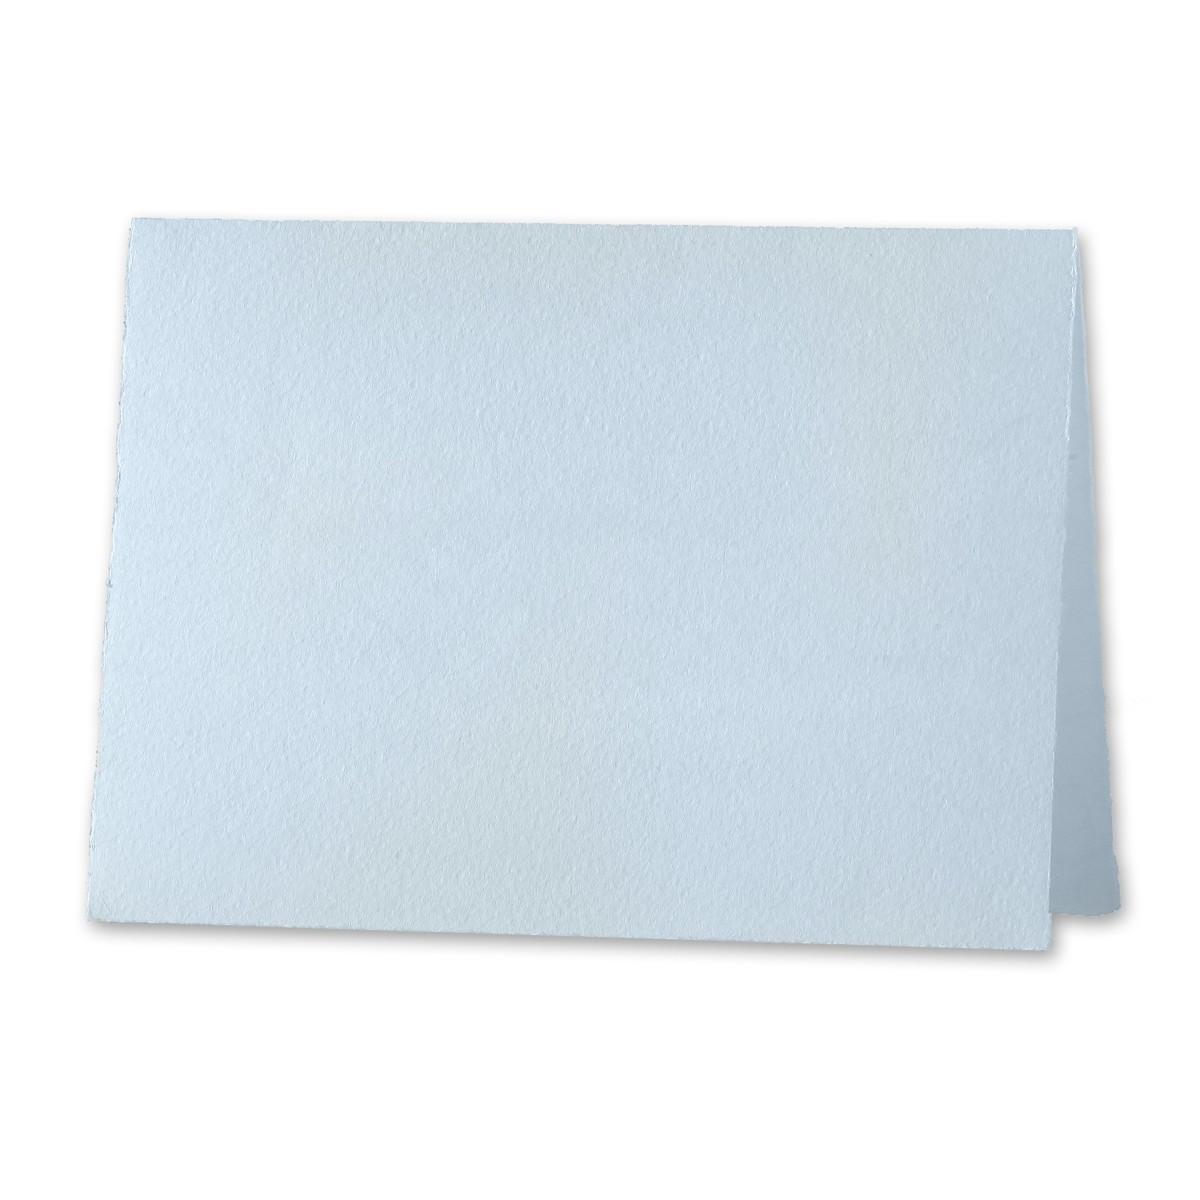 "Arturo Pale Blue Invitation Foldovers (600LC) 97# Cover (6.69"" x 9.05"" open size) Bulk Pack of 100"